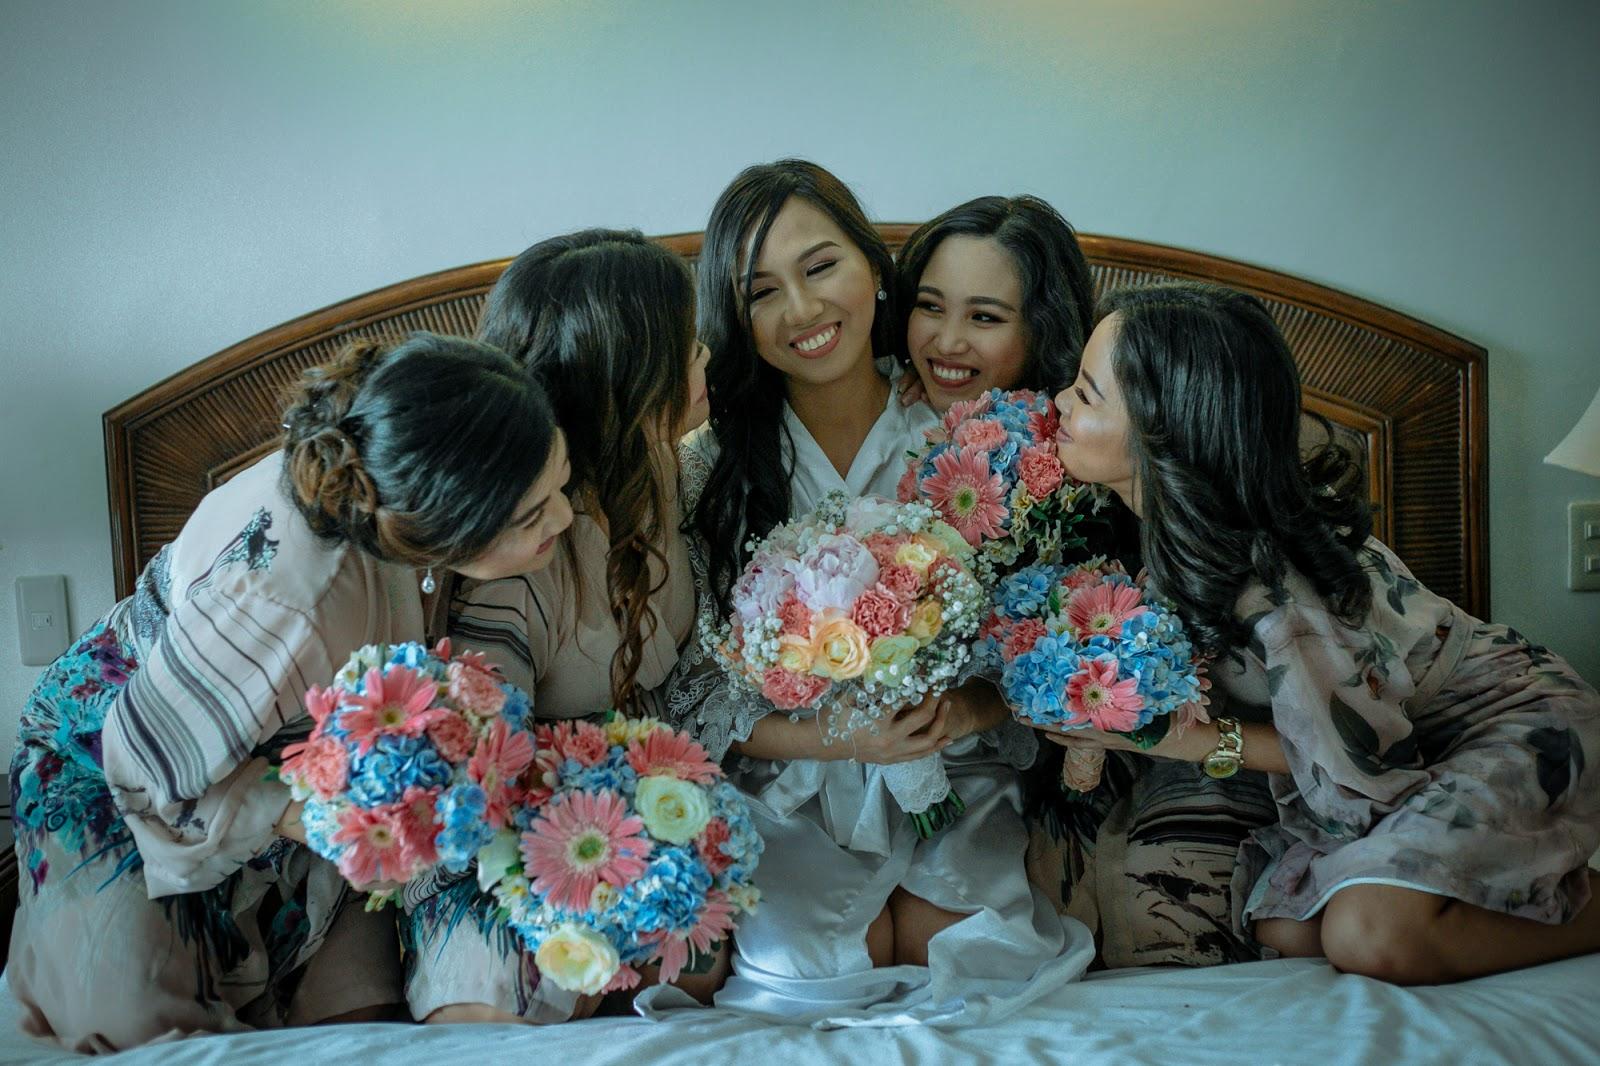 wedding robes, bridesmaids and maid of honor